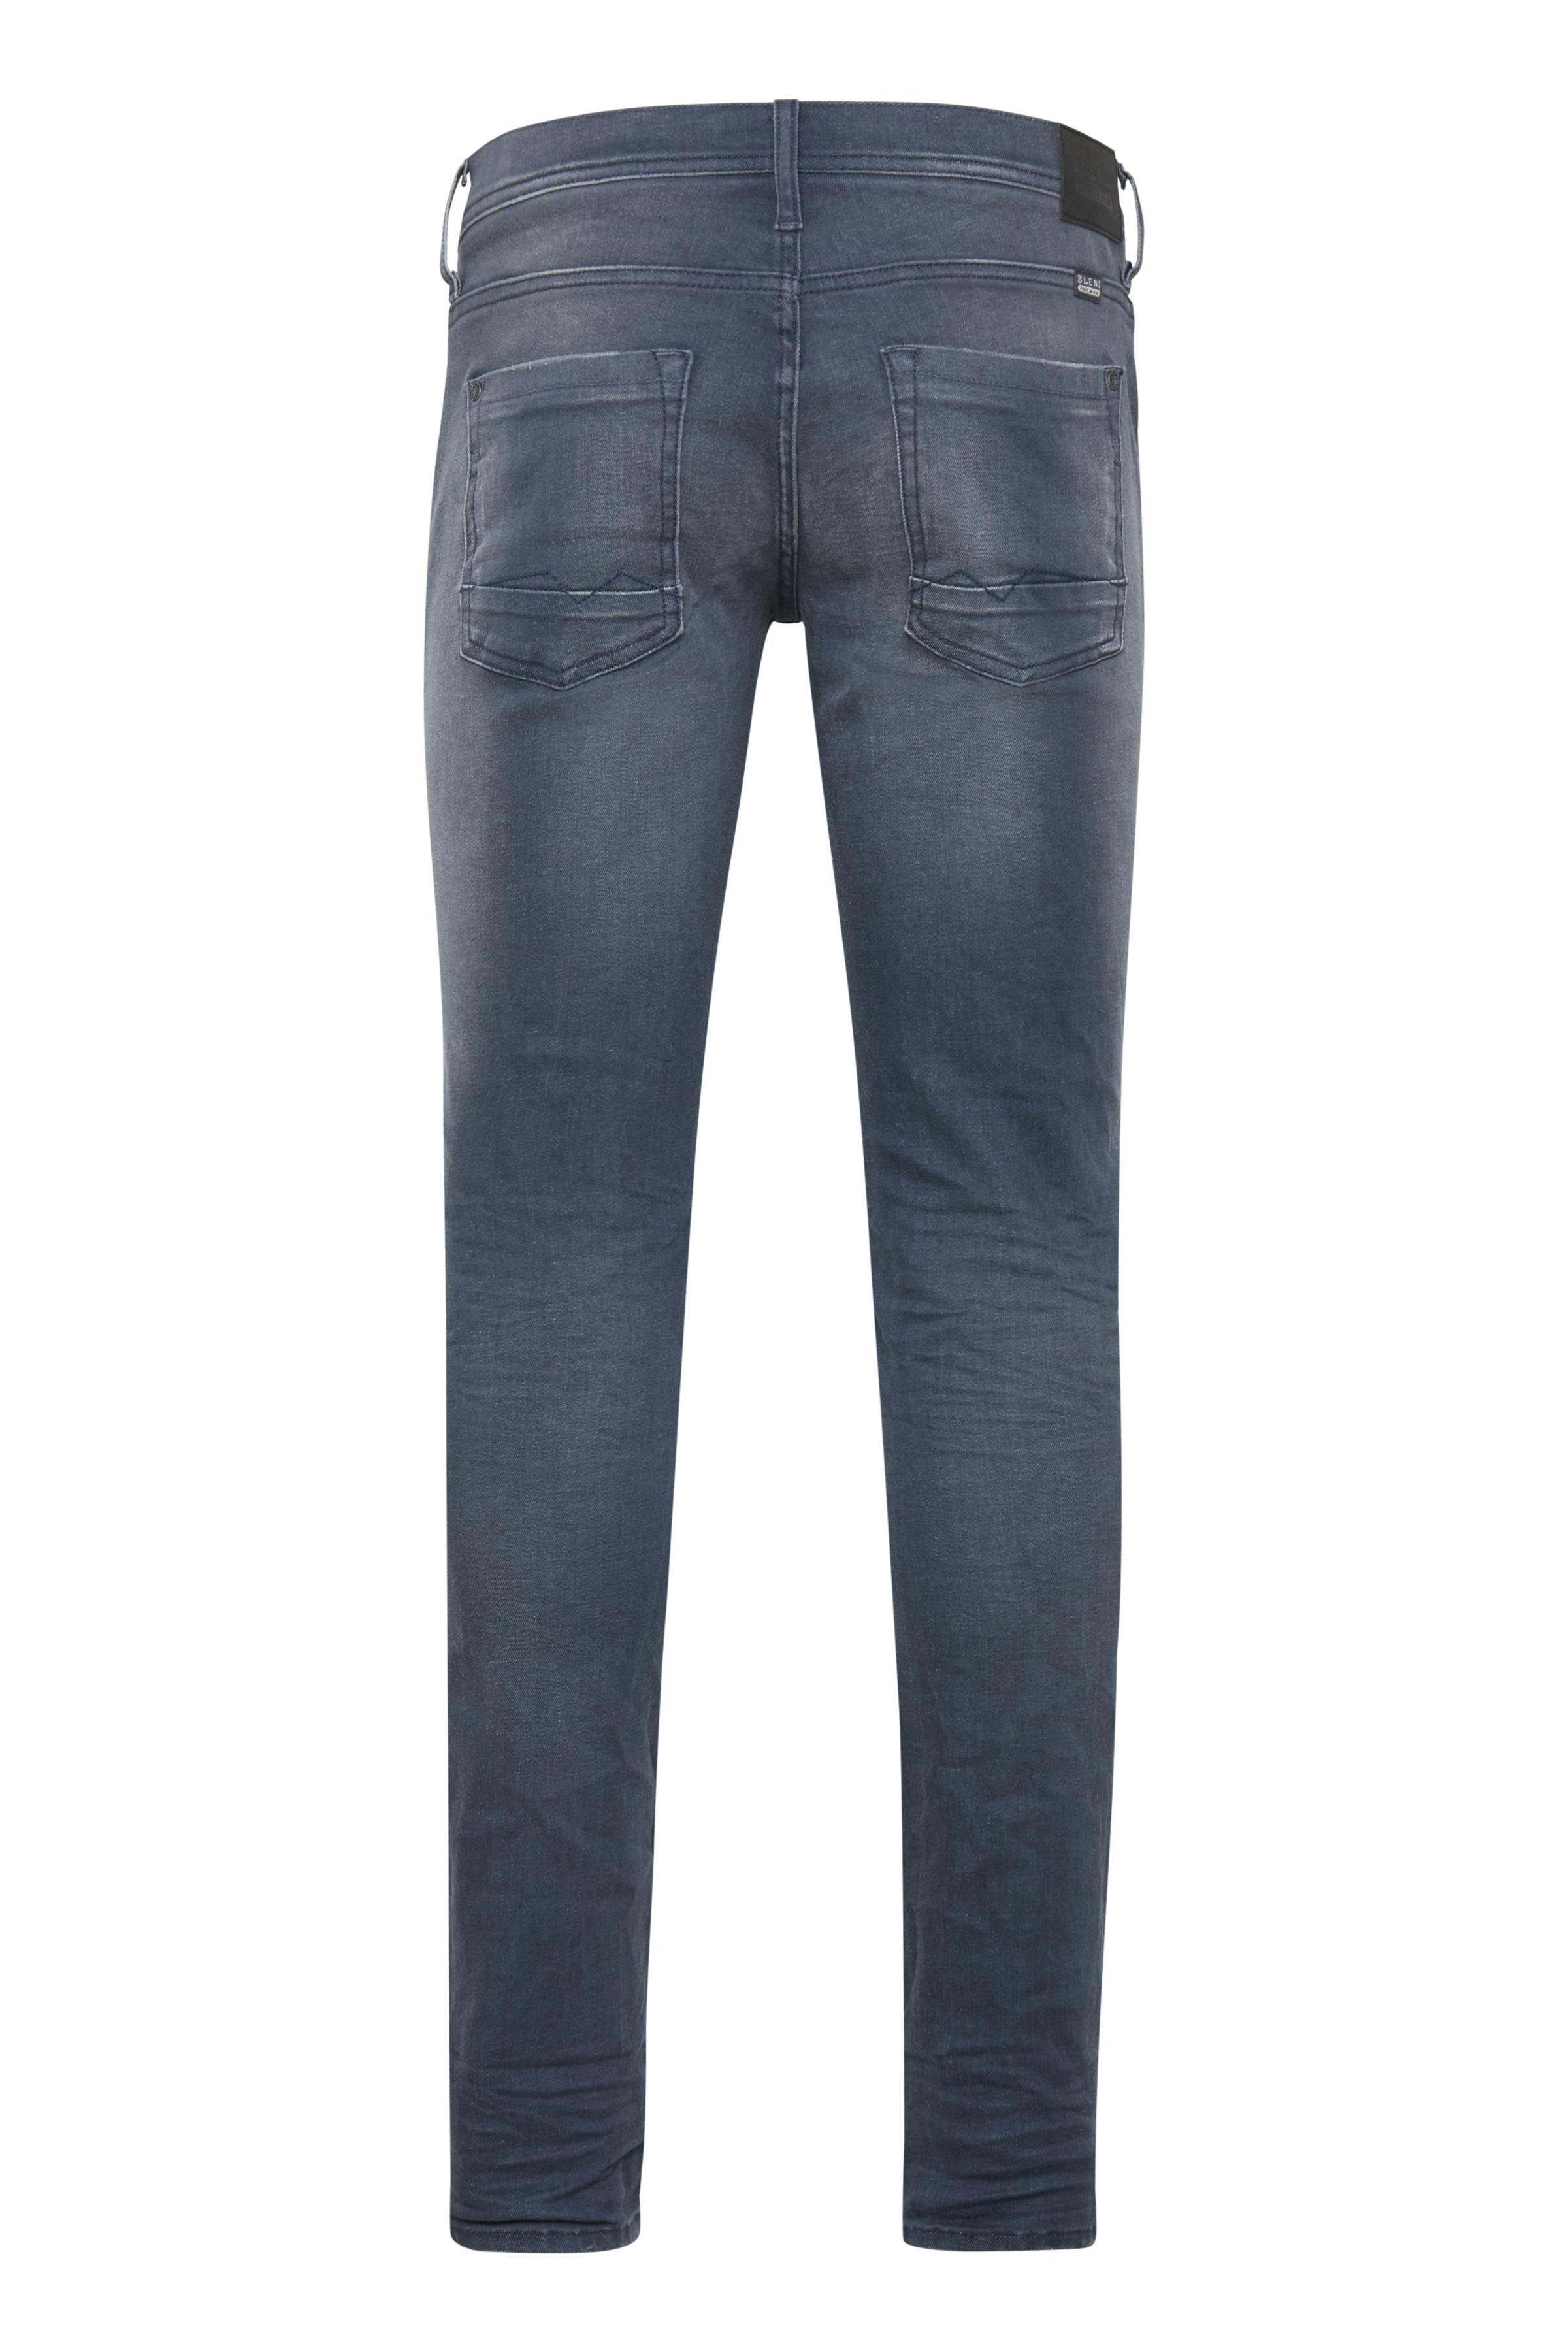 Denim dark blue Cirrus jeans – Køb Denim dark blue Cirrus jeans fra str. 25-40 her